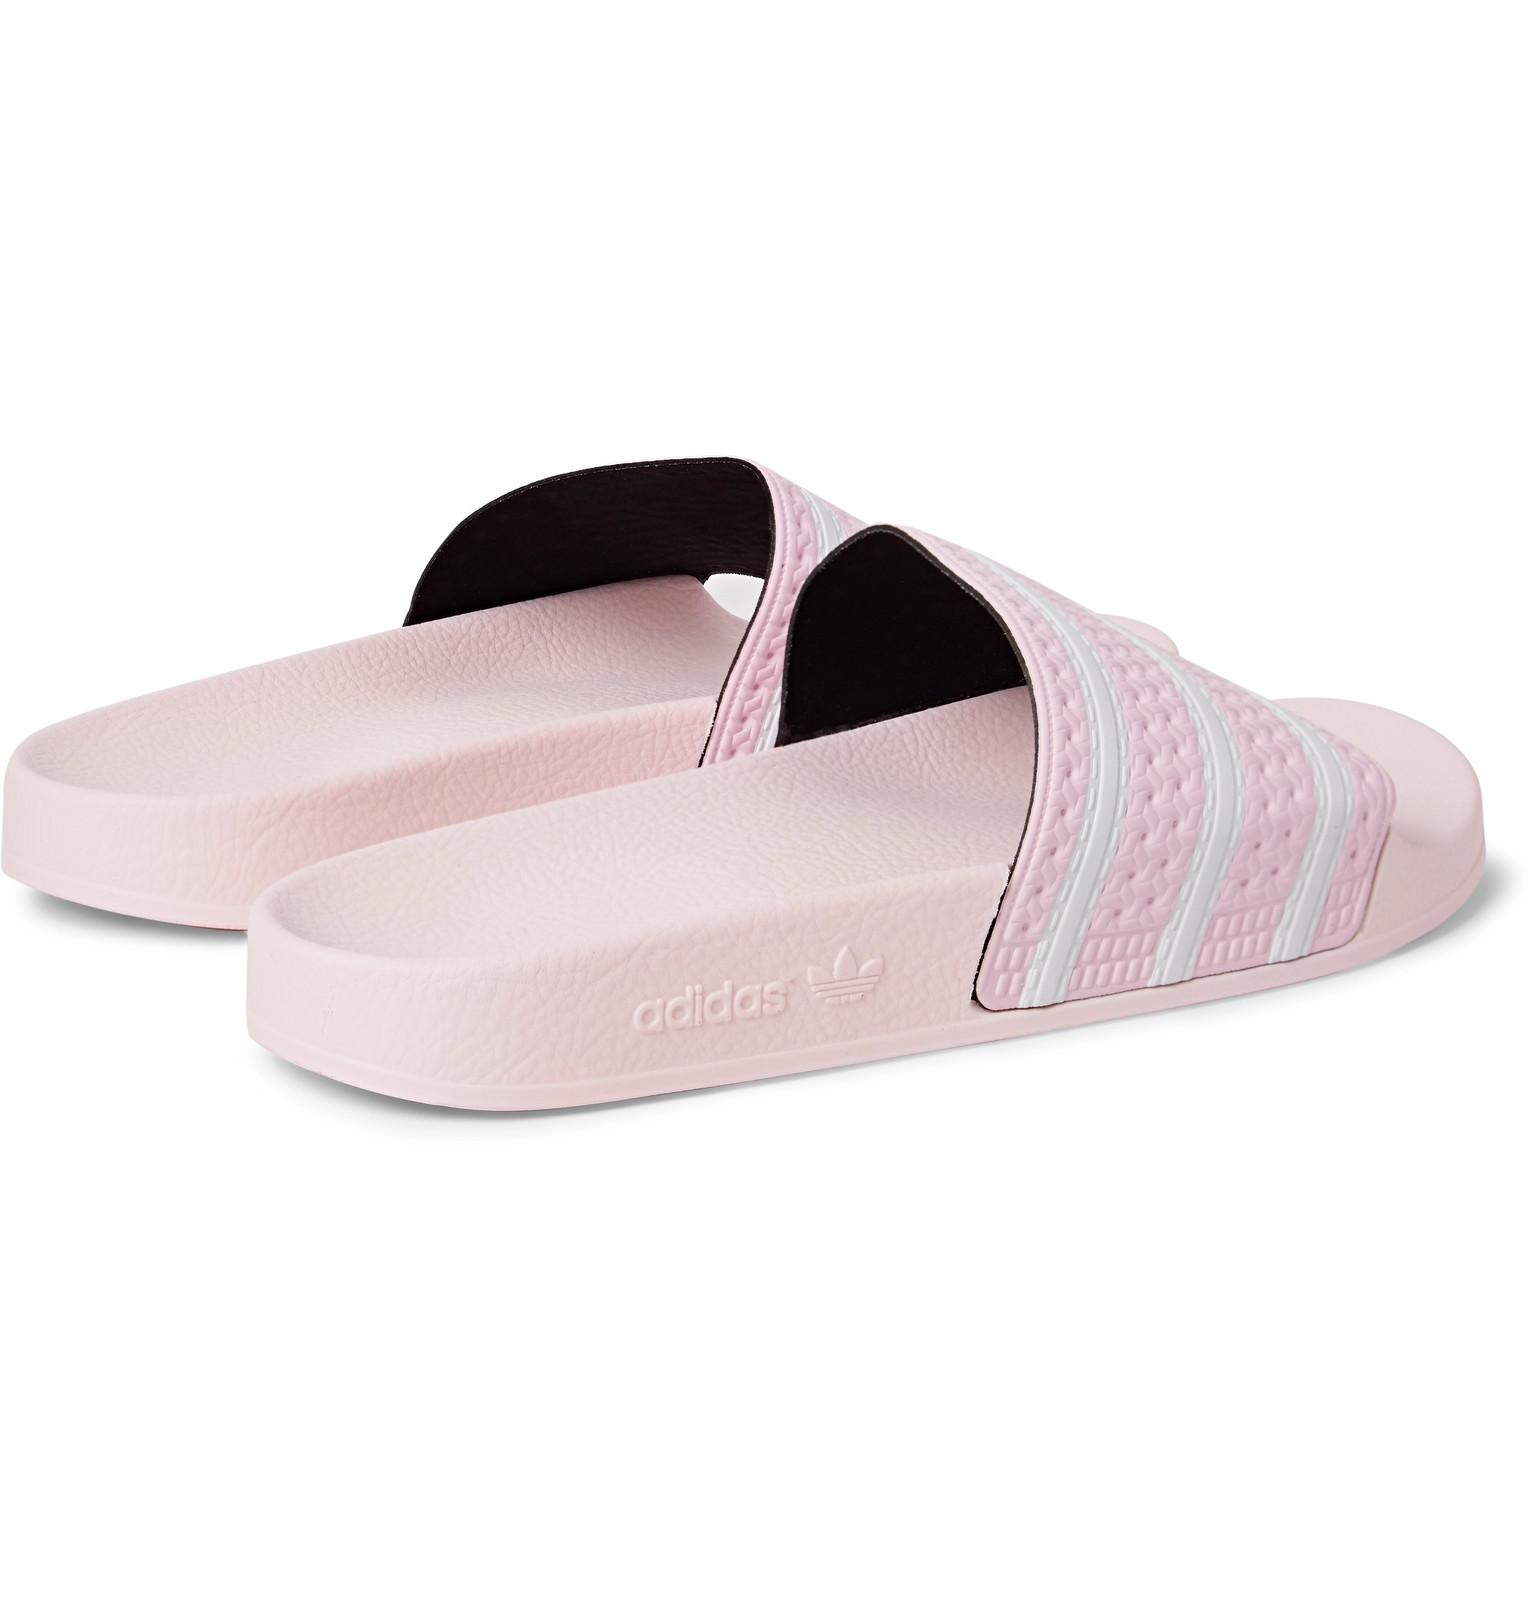 957cbbb26f45 Adidas Originals - Pink Adilette Textured-rubber Slides for Men - Lyst.  View fullscreen